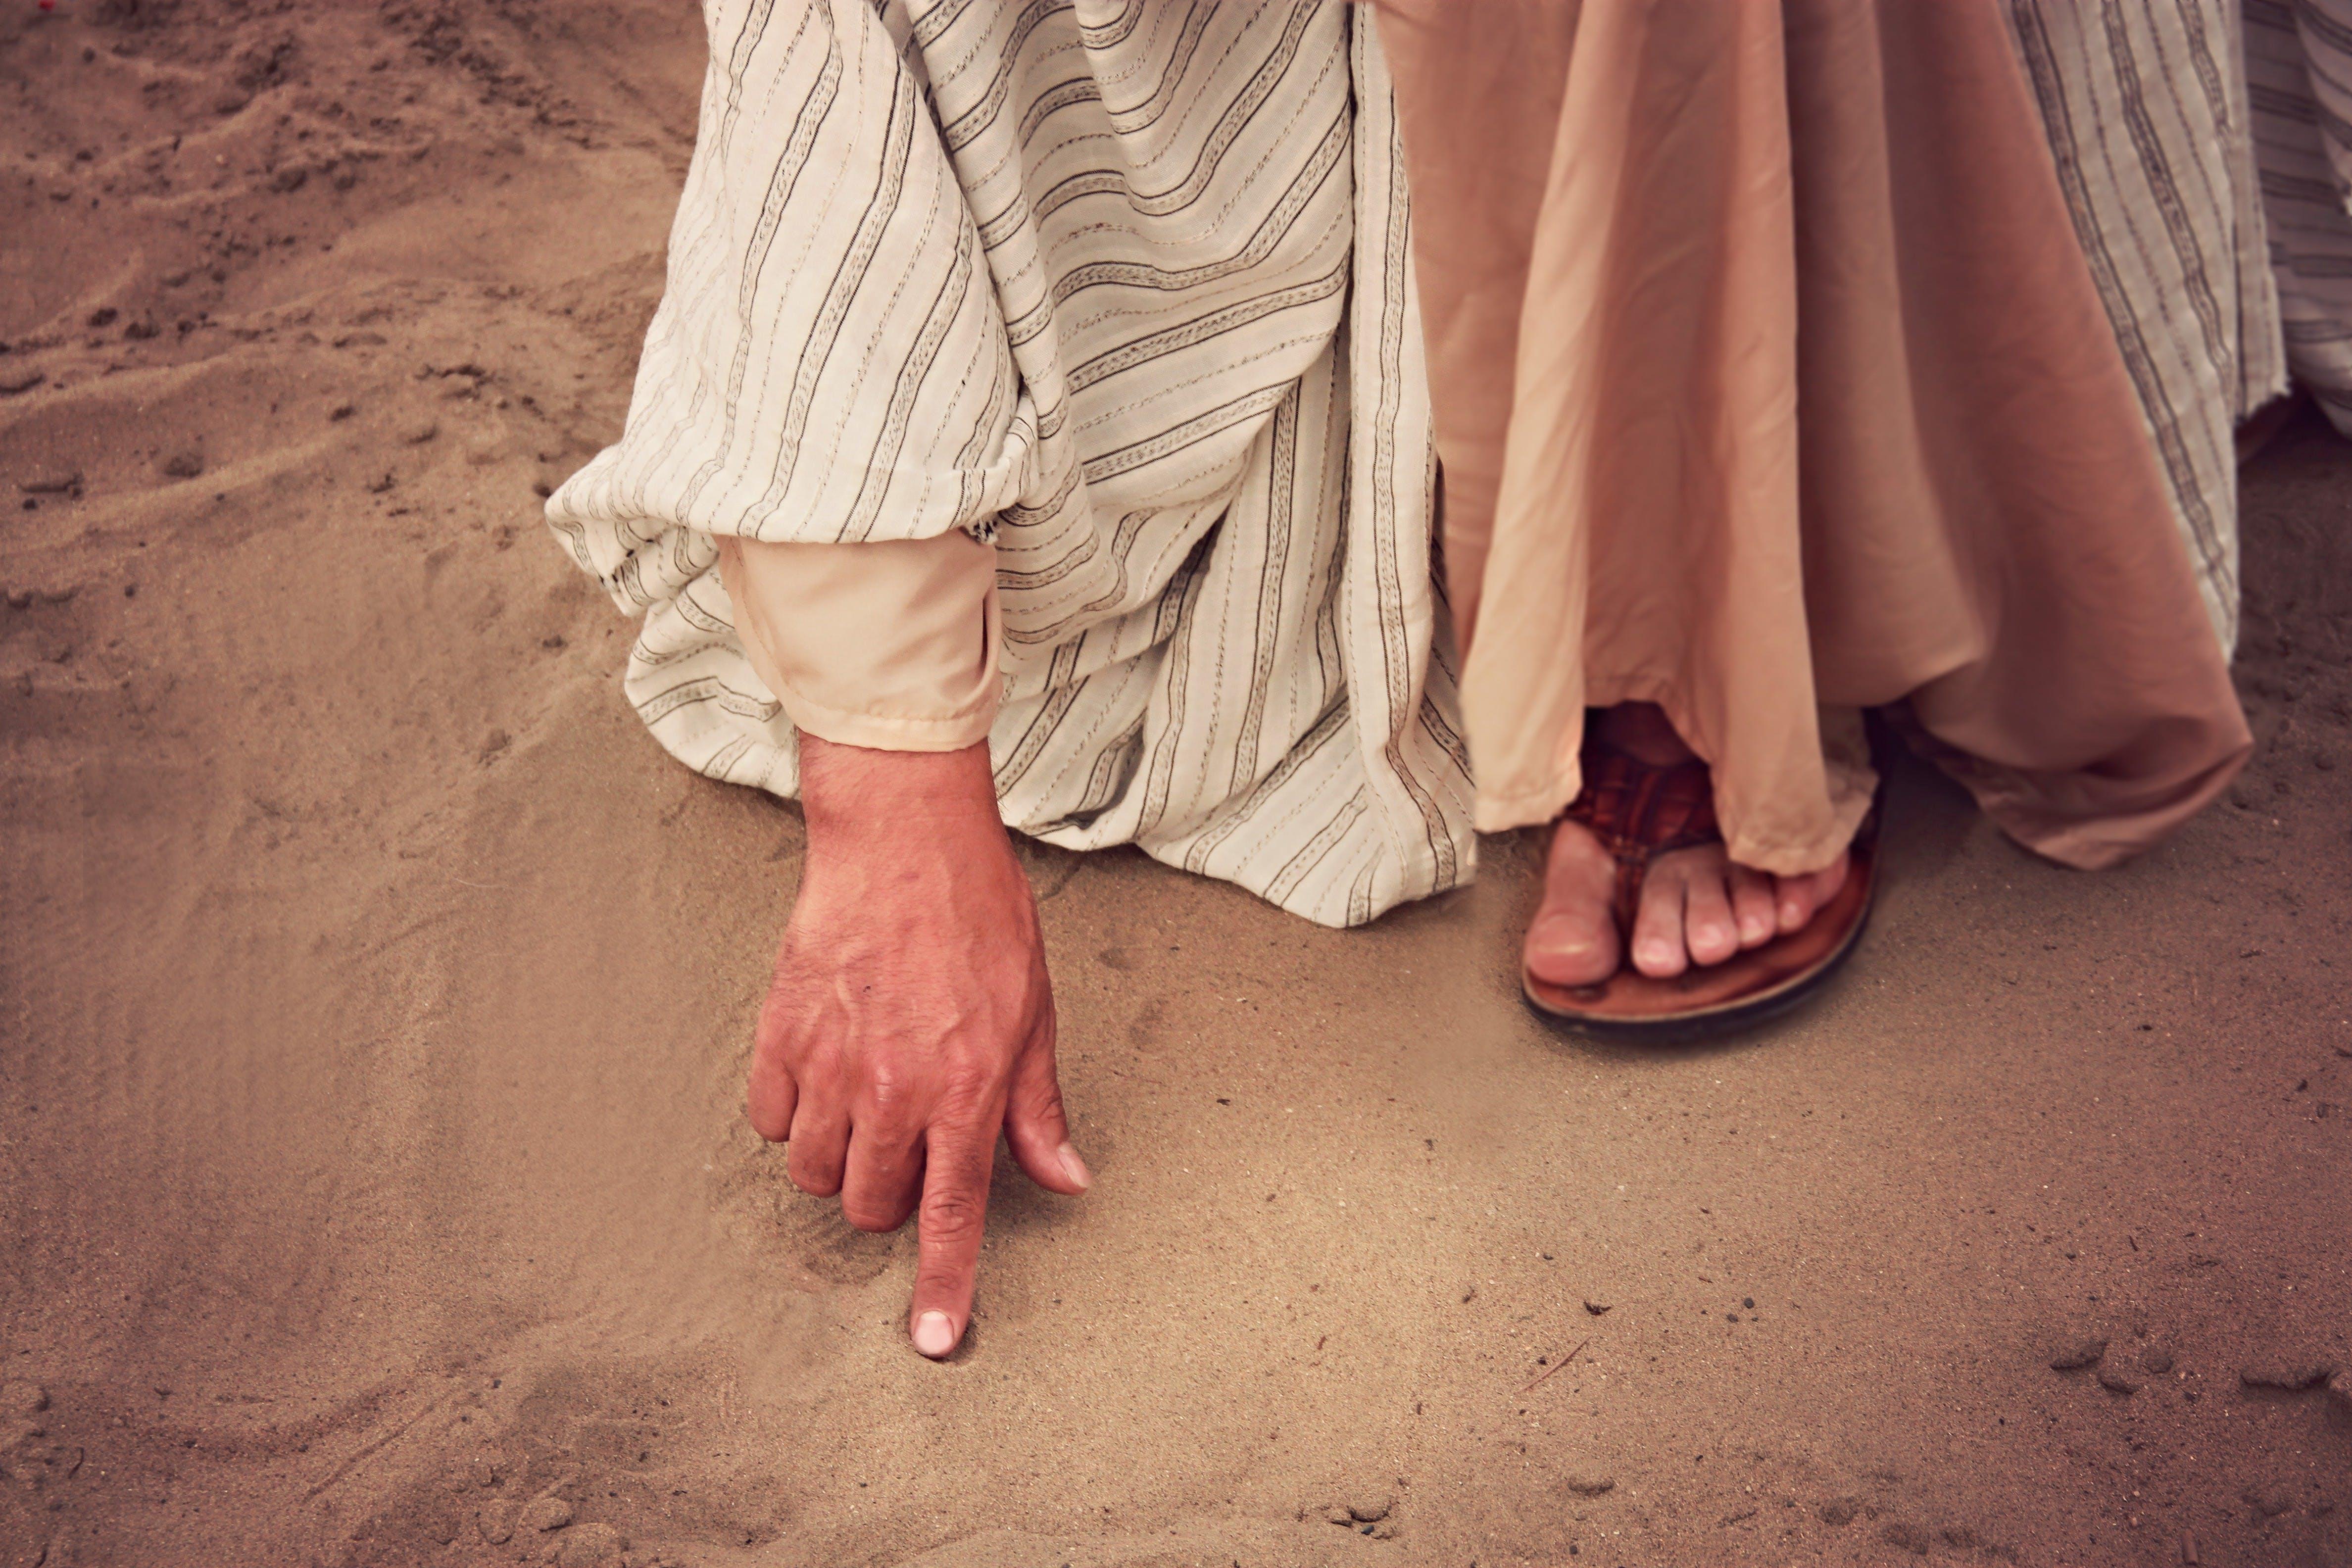 Kostenloses Stock Foto zu fashion, hand, person, sand